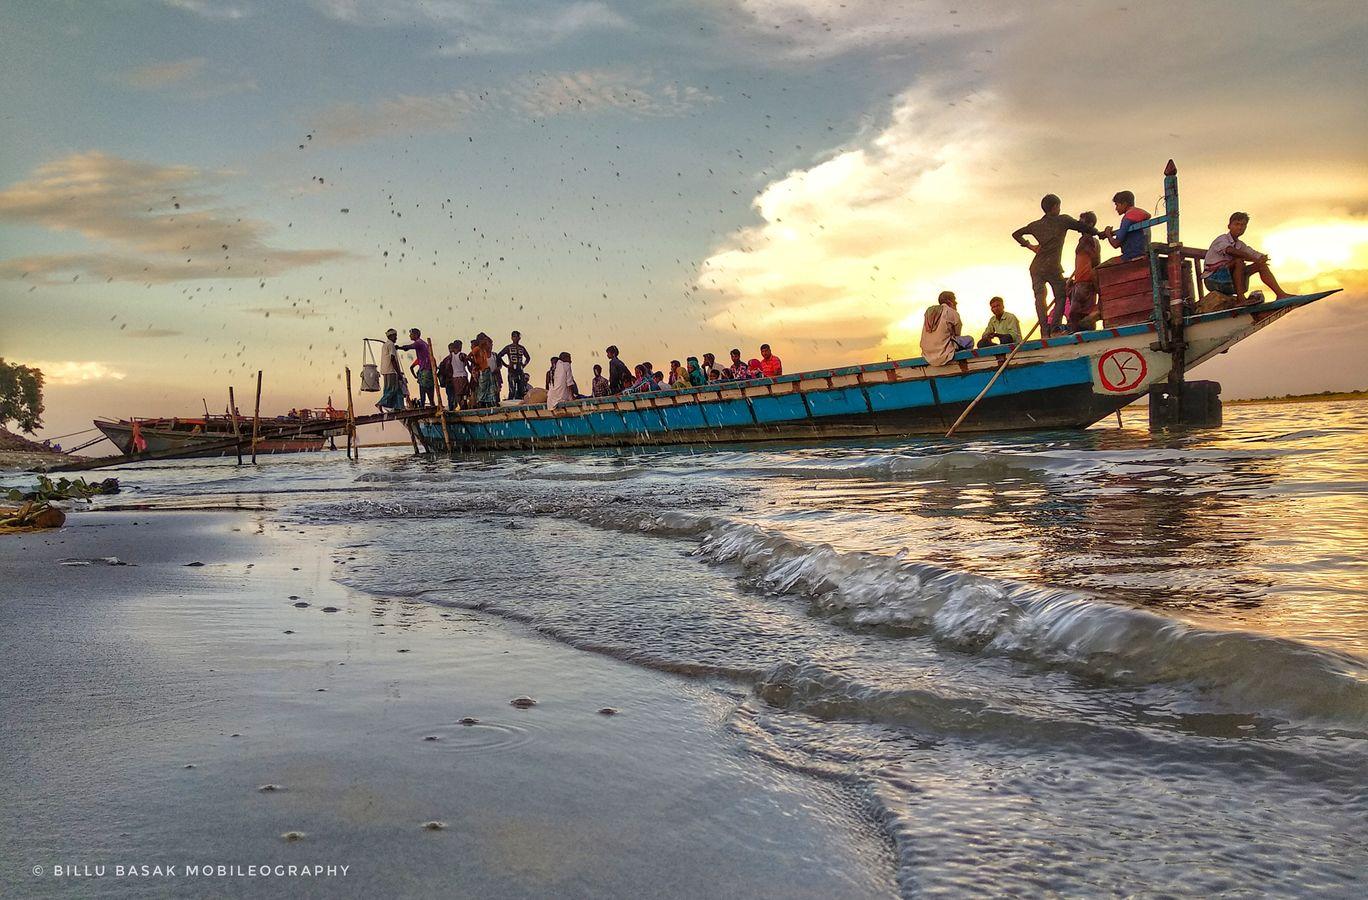 Photo of Brahmaputra River By Billu Basak